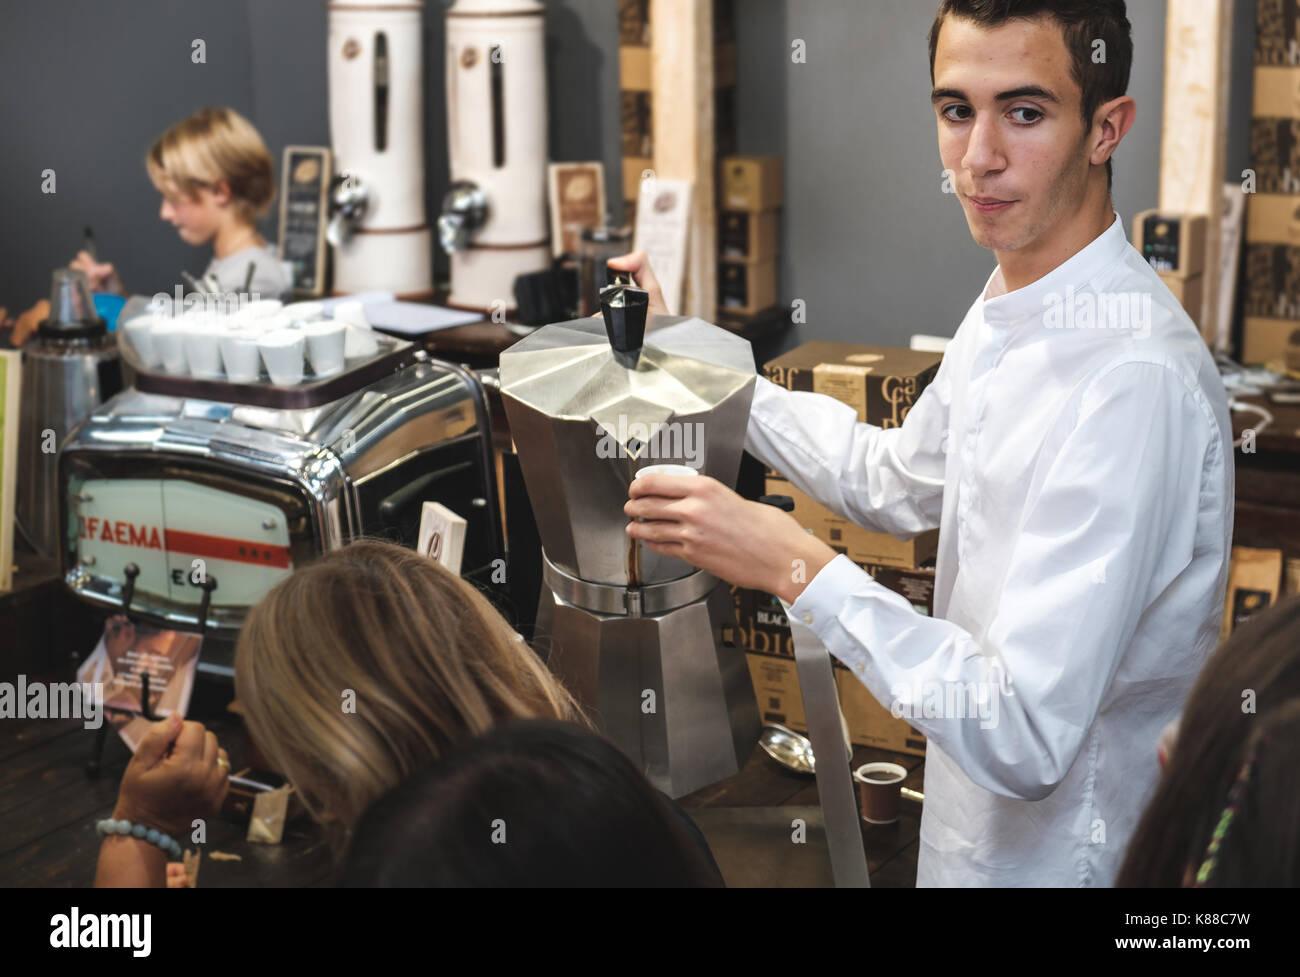 Caffe Italiano at the BAR, italian coffee habits a young italian waiter barista serving coffee from a giant moka coffeepot - Stock Image